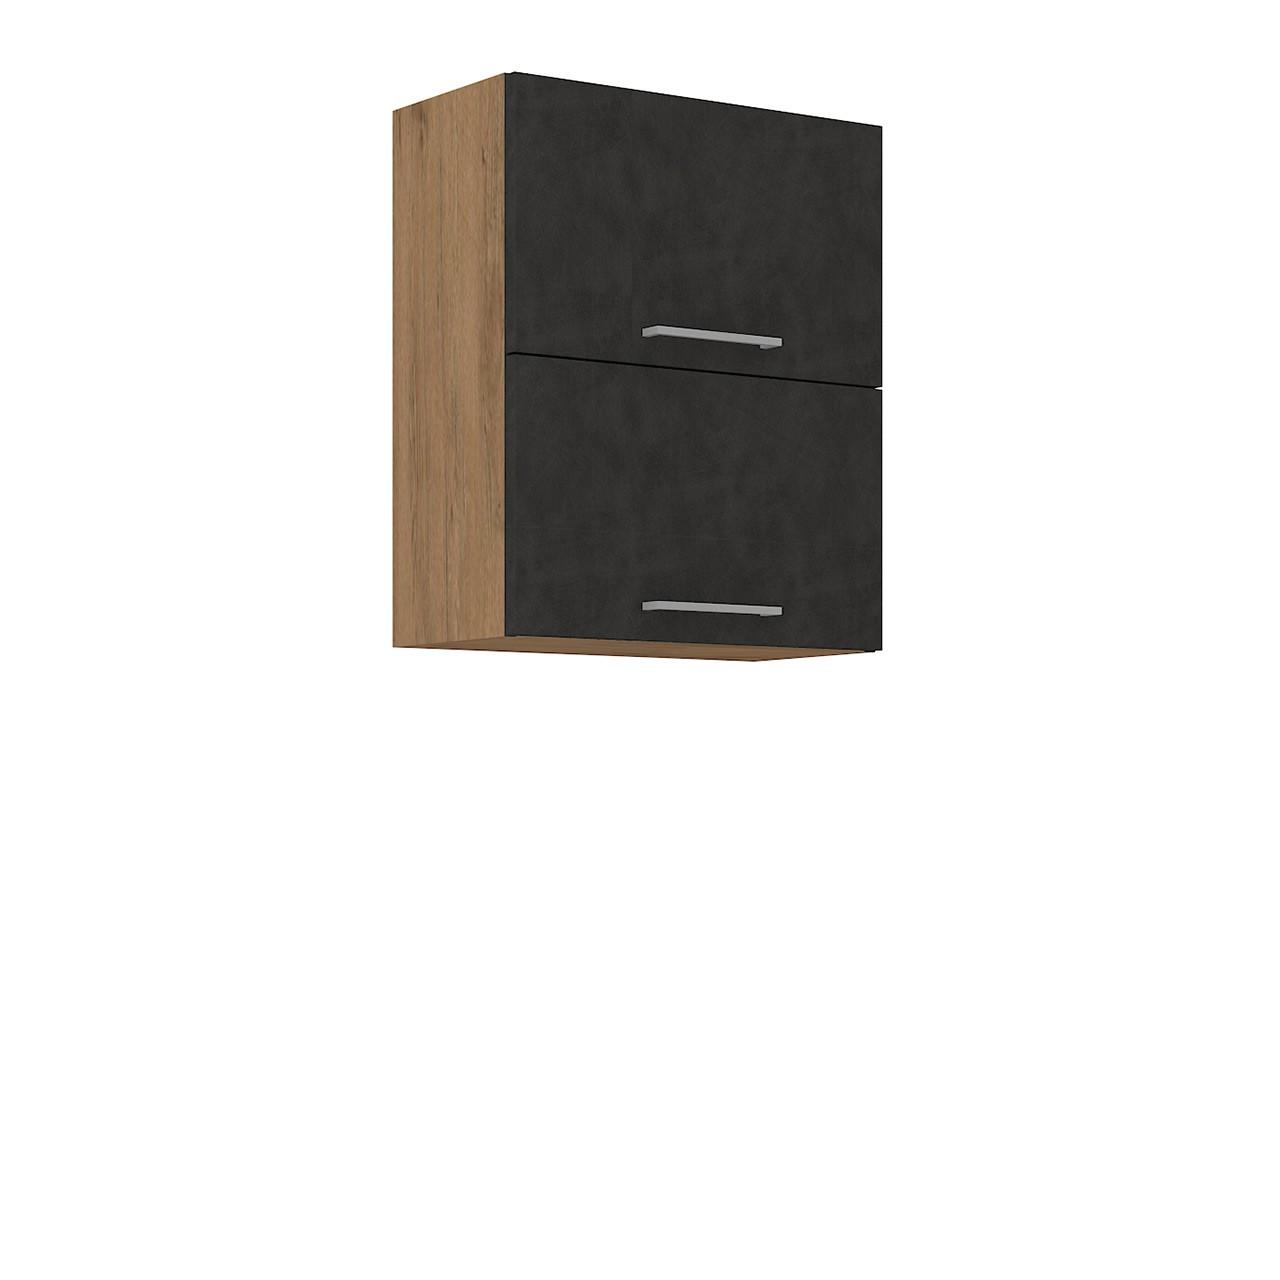 Incredible Hangeschrank Woodline 60 Gu 72 2F Mirjan24 Interior Design Ideas Gentotryabchikinfo